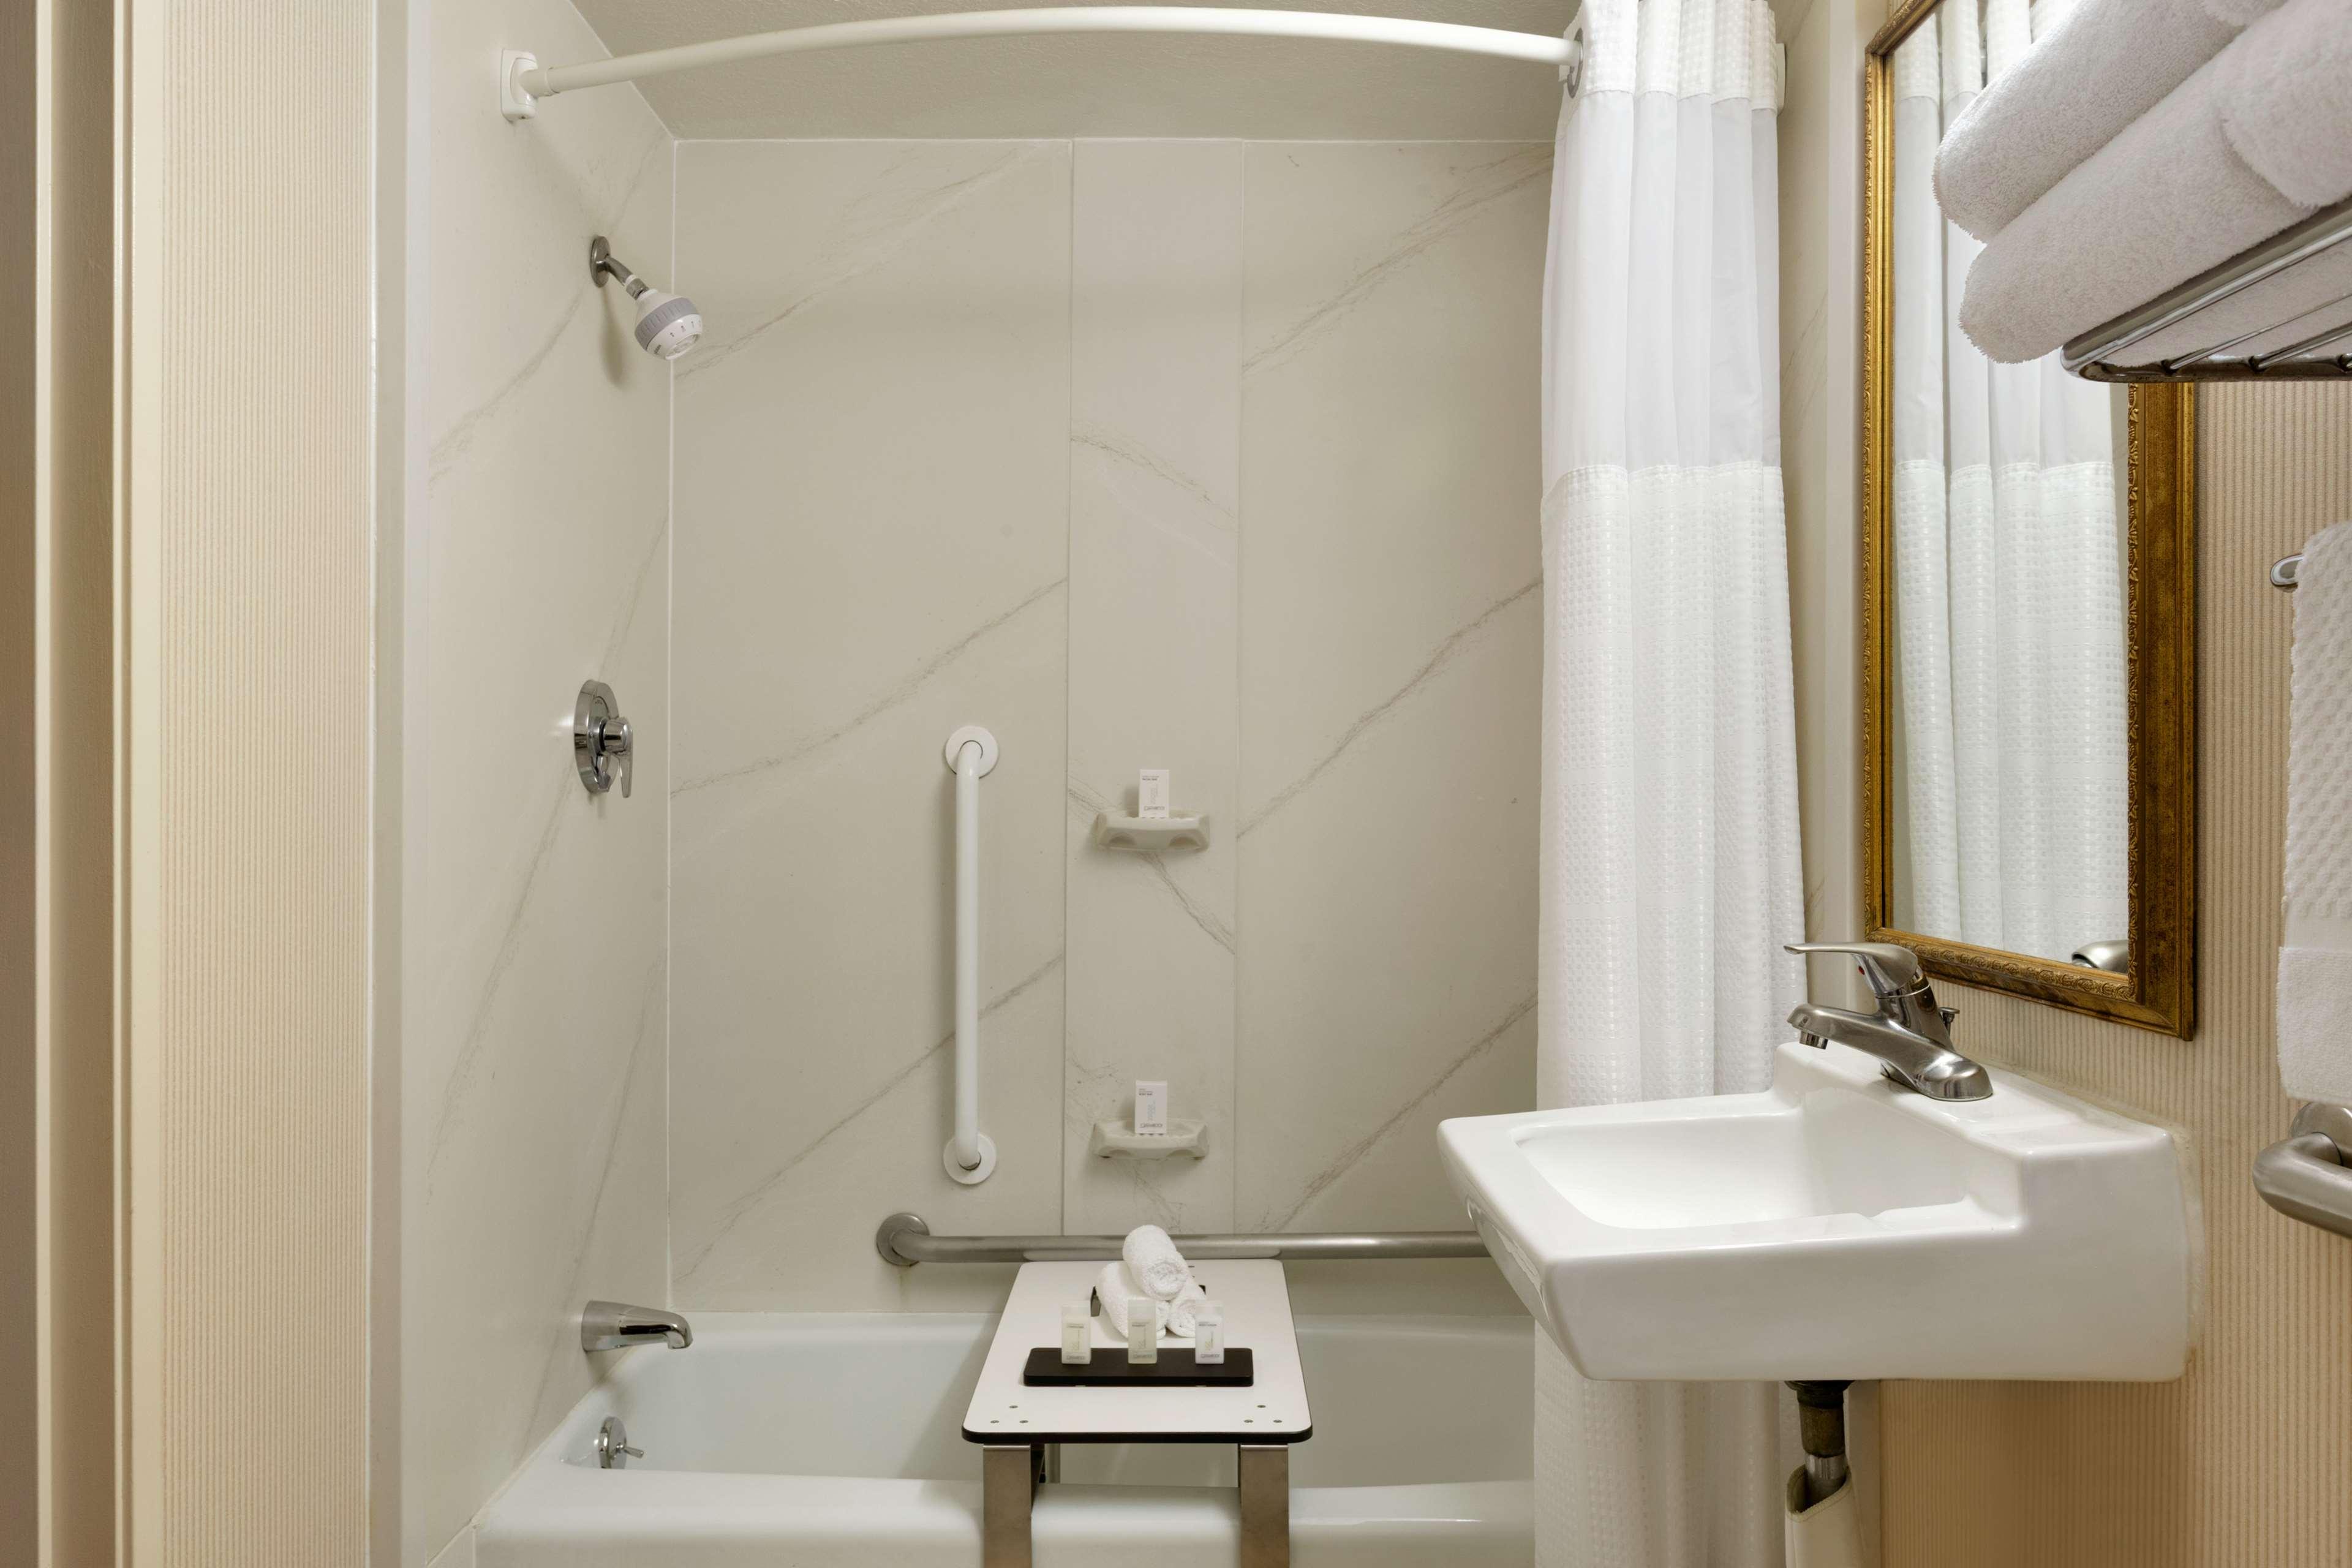 Embassy Suites by Hilton Arcadia Pasadena Area image 30